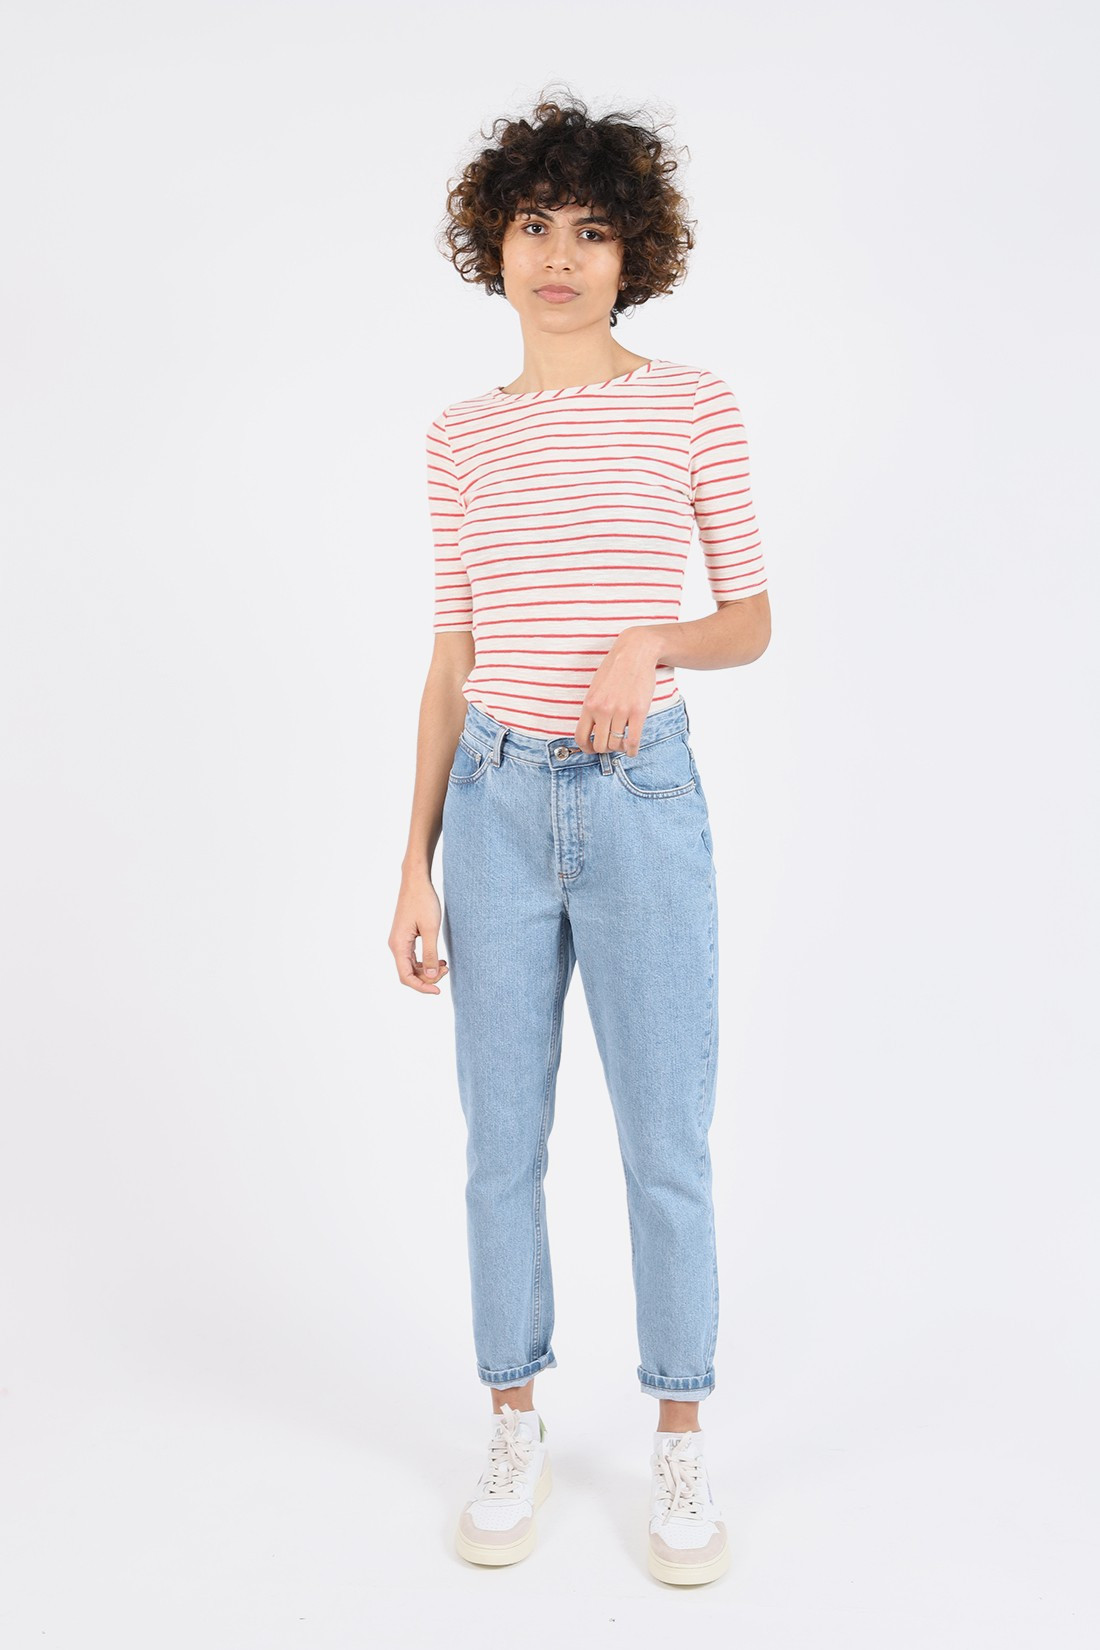 BELLEROSE FOR WOMAN / T-shirt seas Stripe c